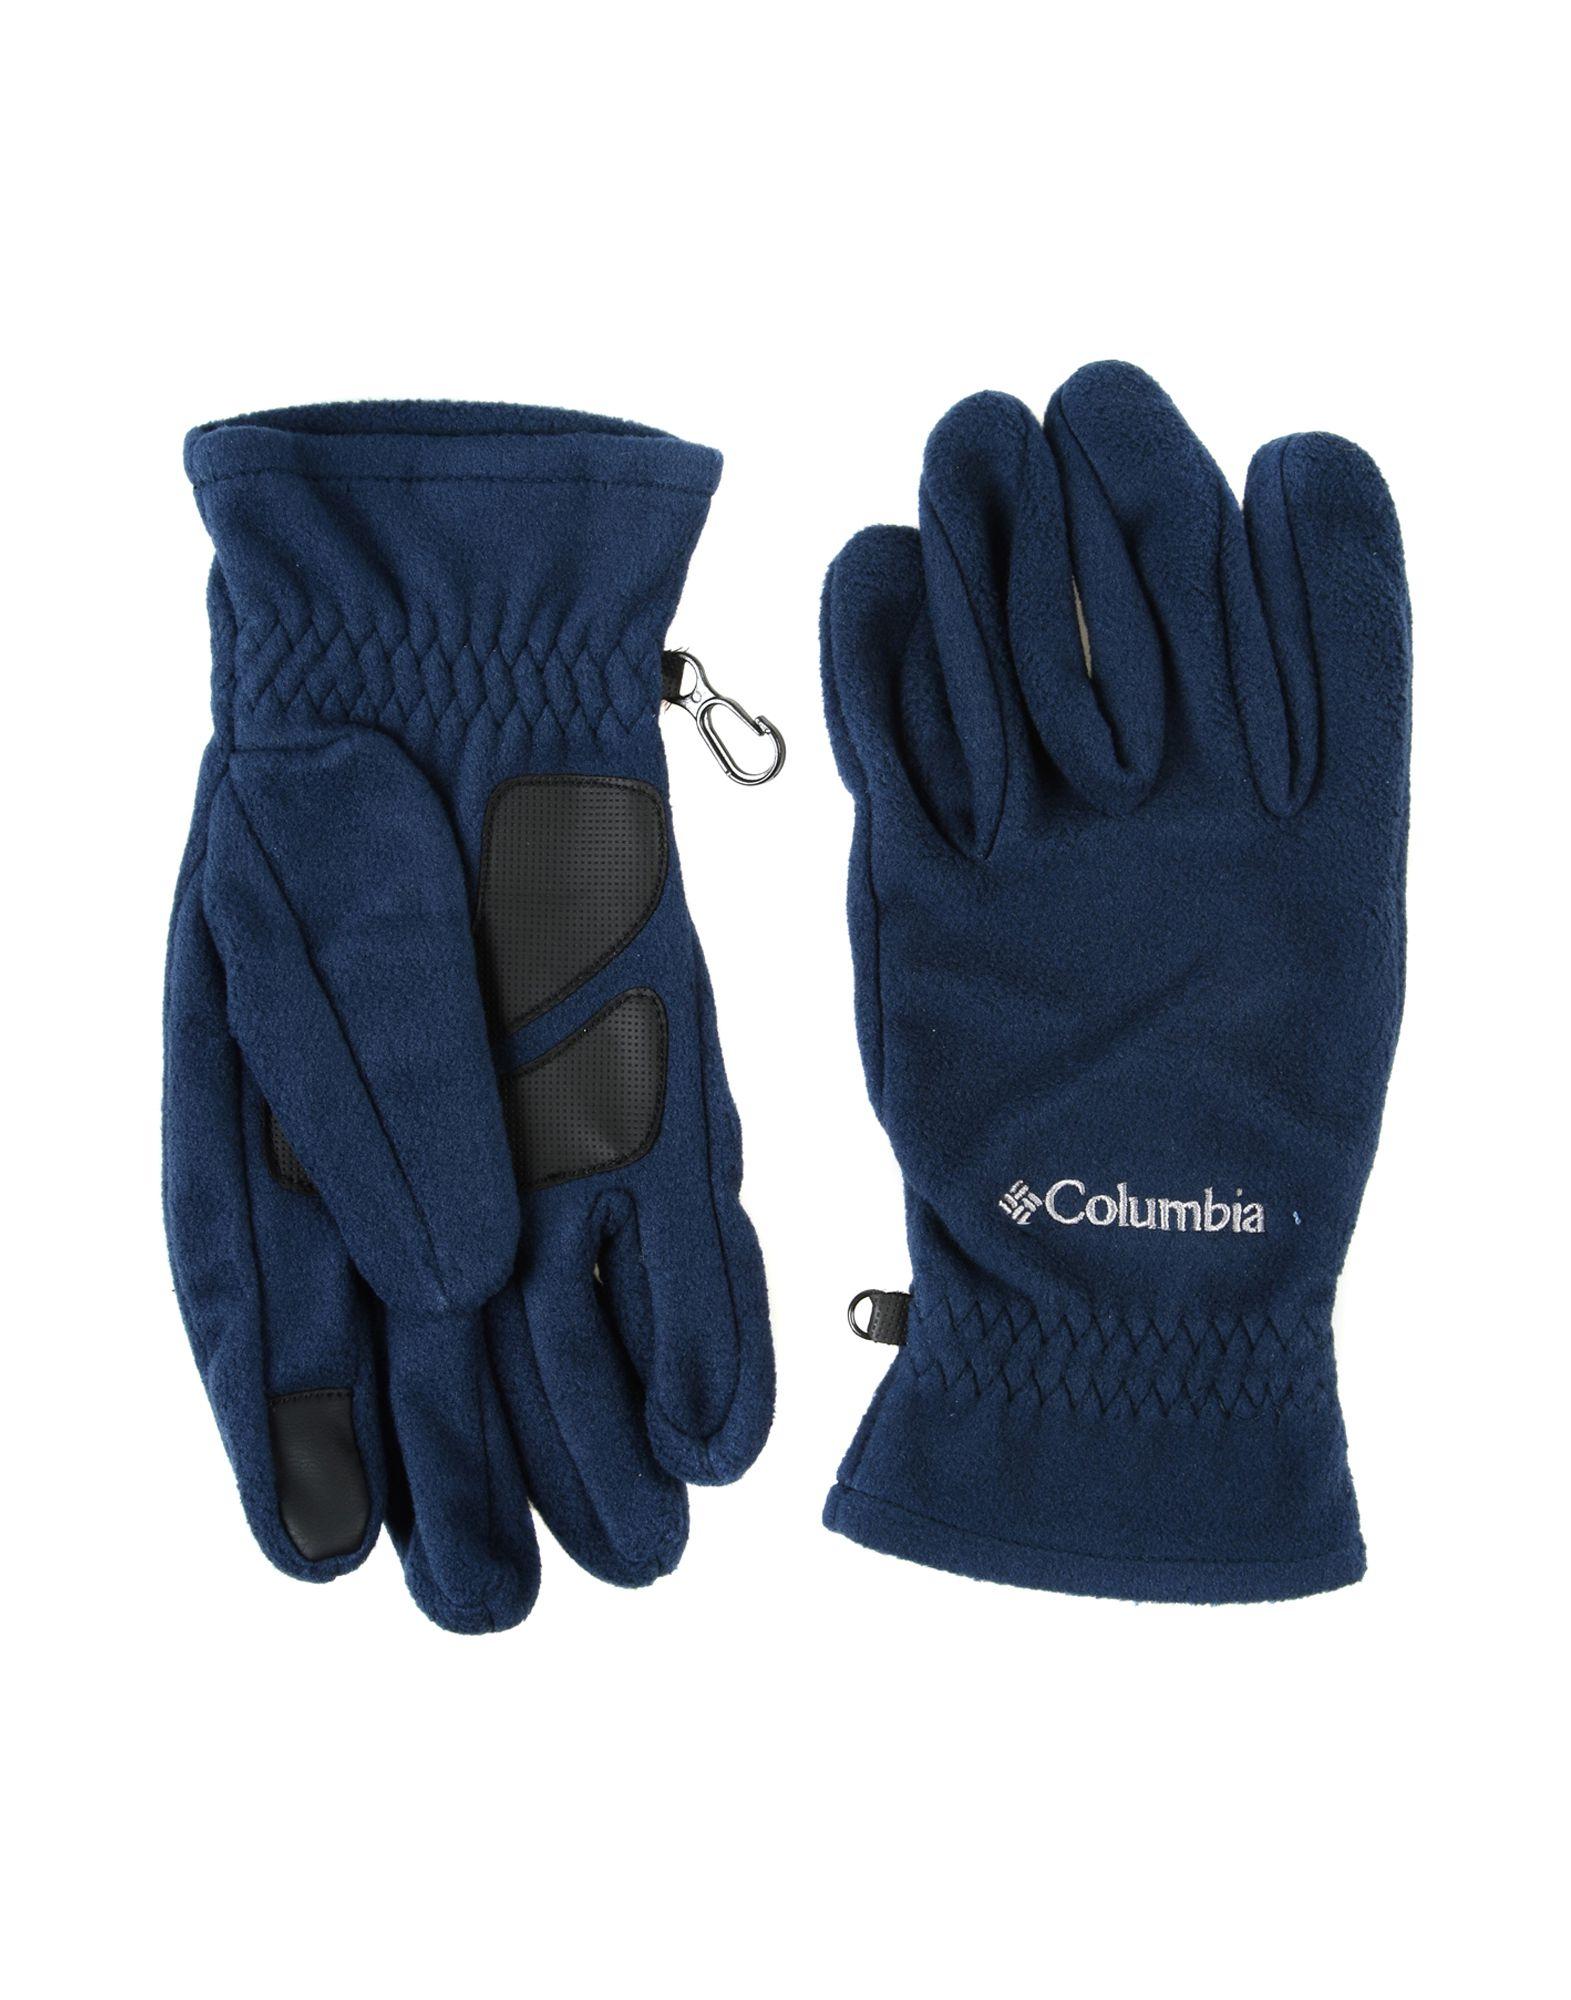 COLUMBIA Перчатки перчатки stella перчатки